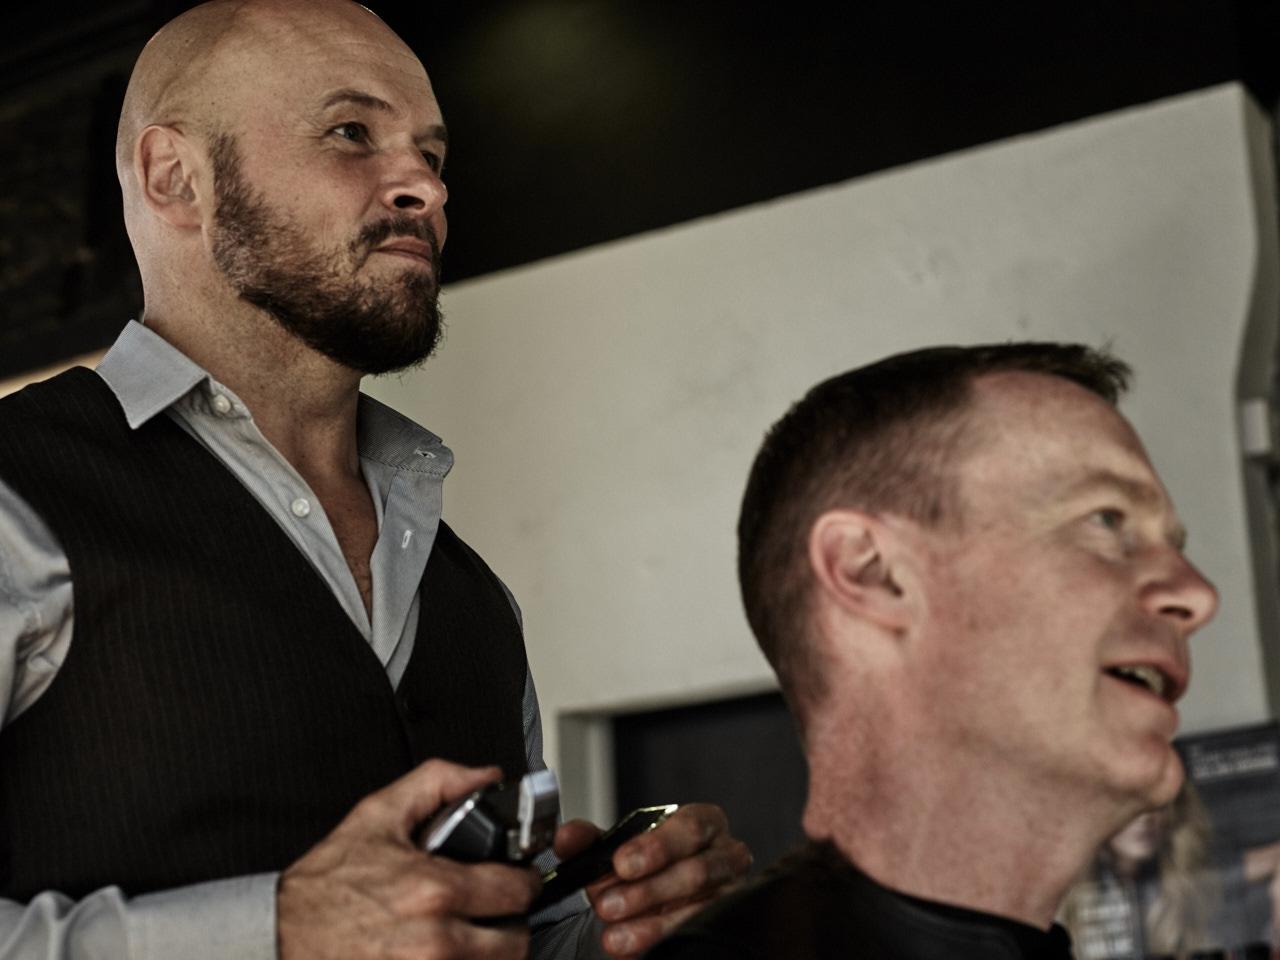 Barber Shop shoot, lifestyle